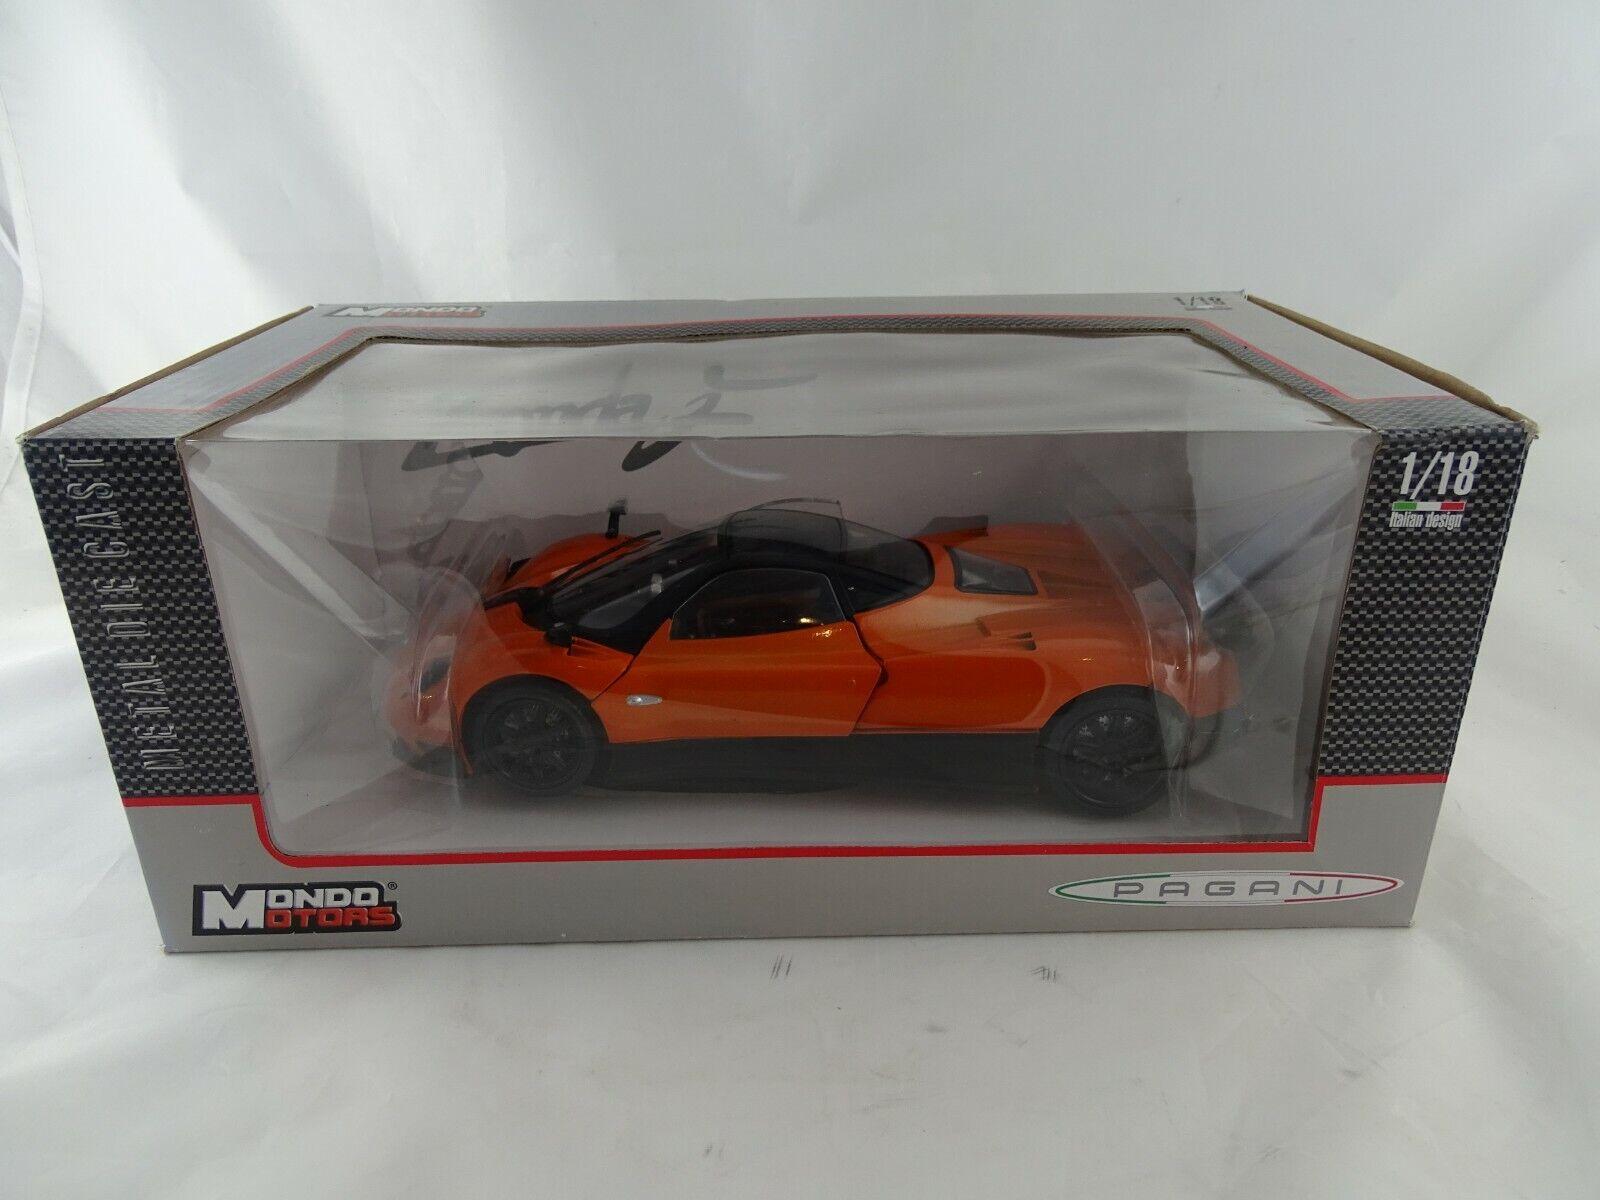 1 18 Mondo Motors Pagani Zonda F Orangemetallic -RARITÄT